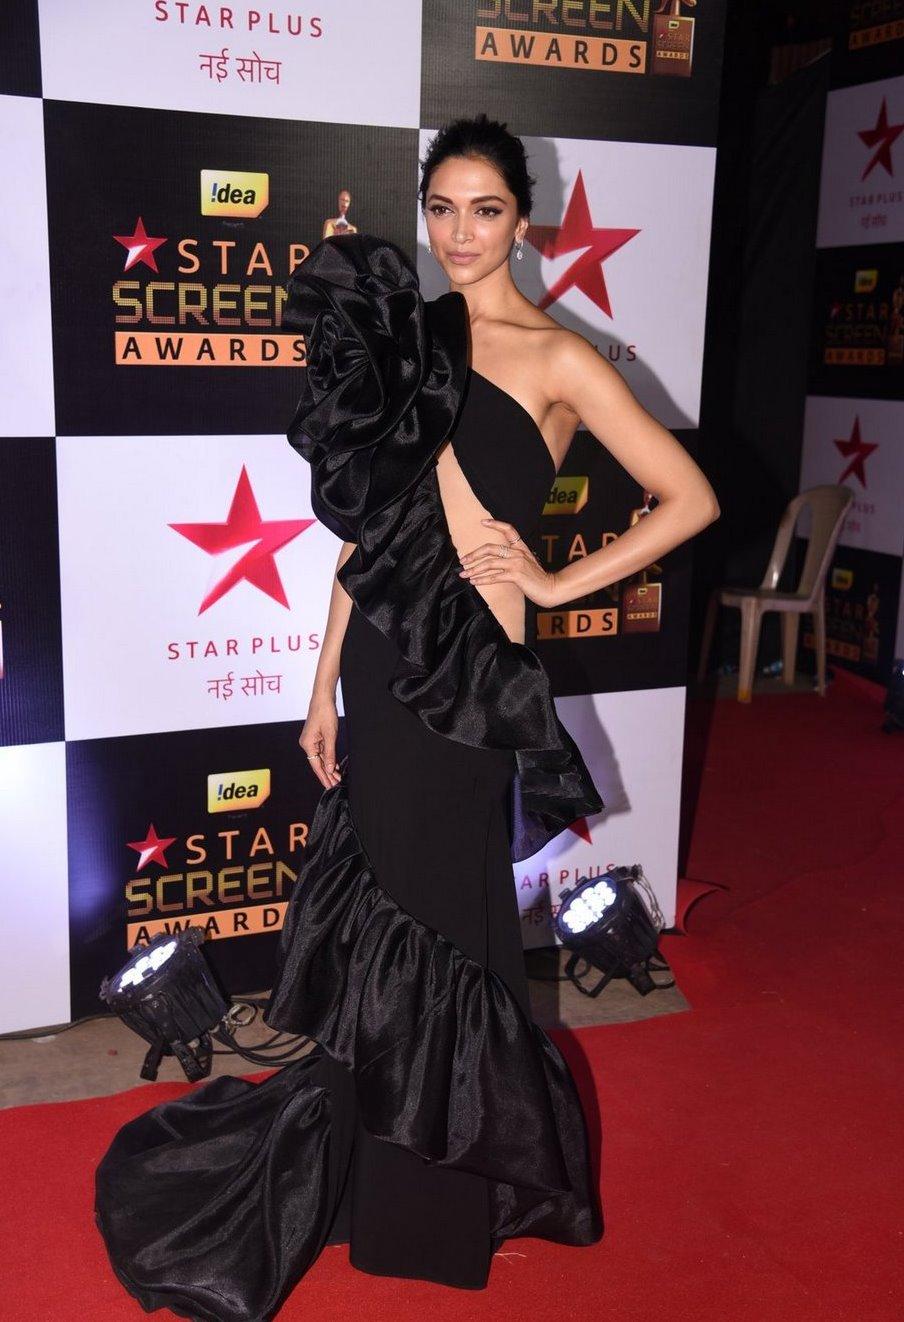 Actress Deepika Padukone at Star Screen Awards In Black Dress